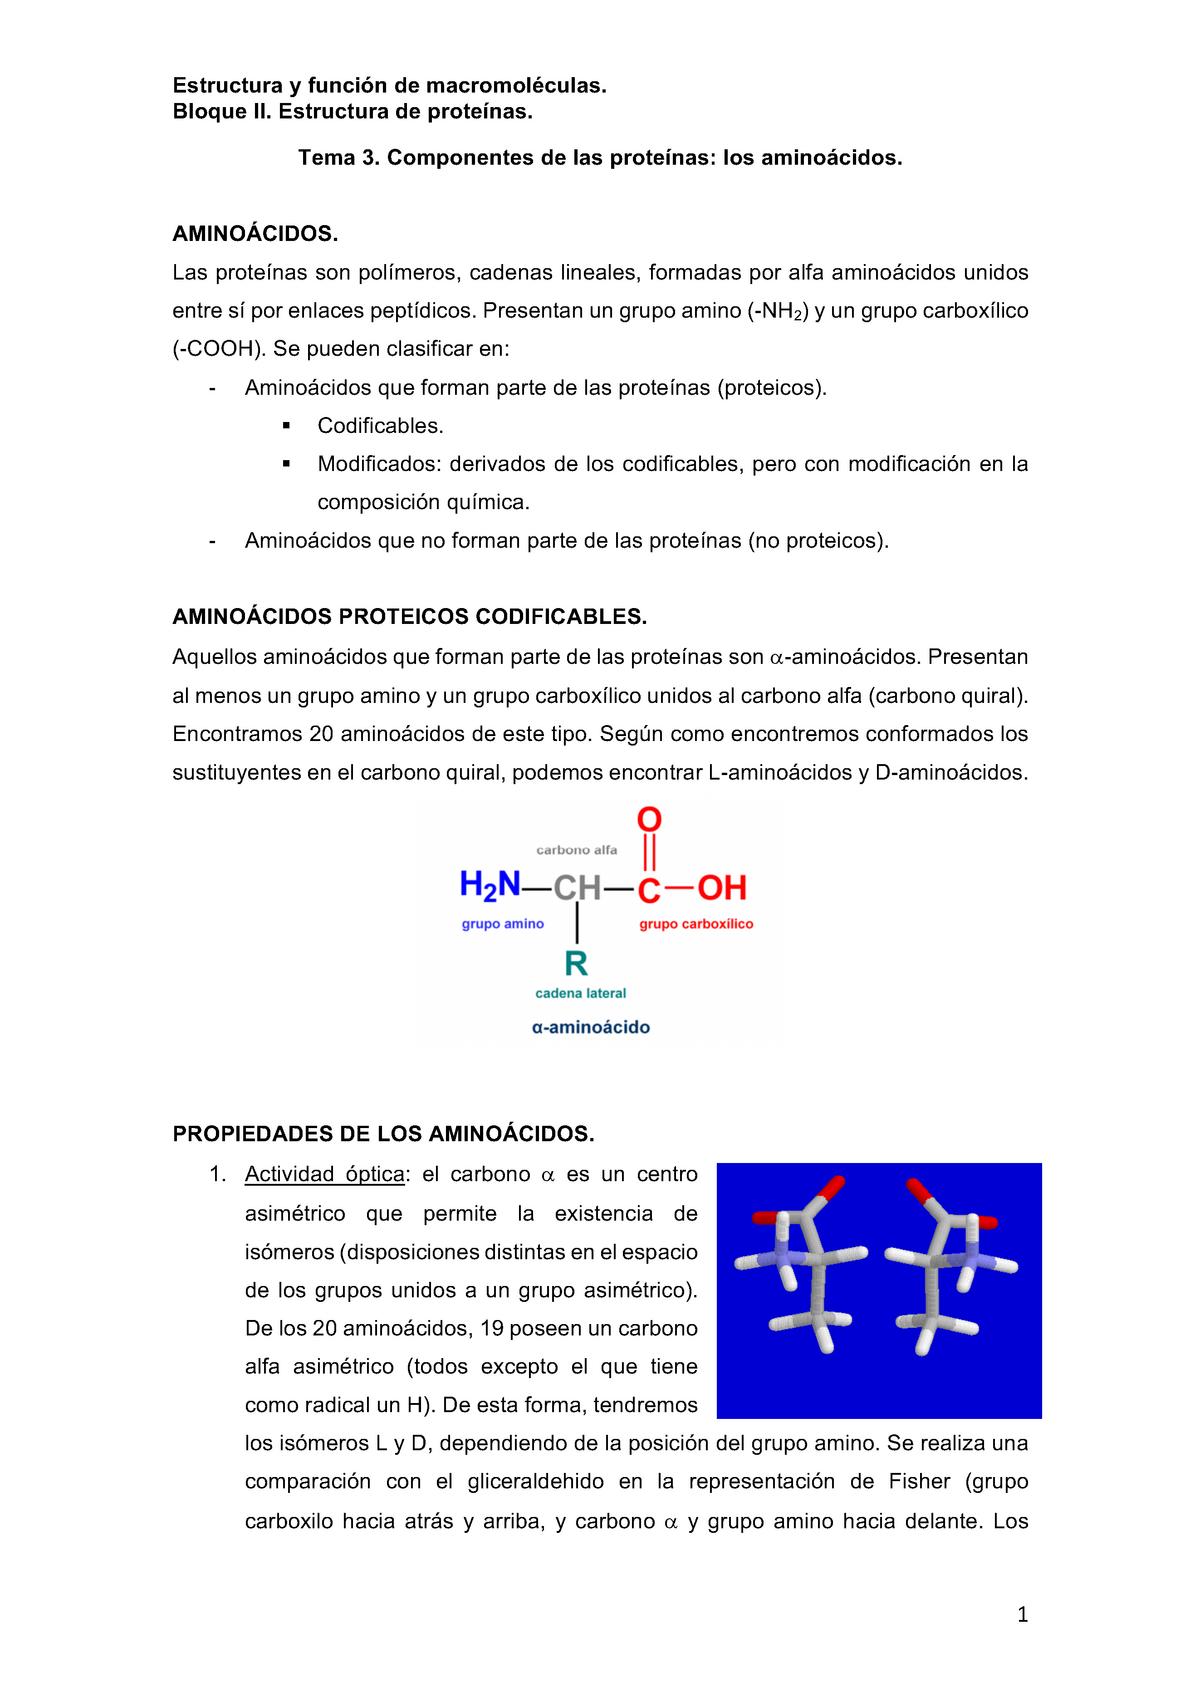 Tema 3 Apuntes De Clase 3 Estructura 21506 Uib Studocu